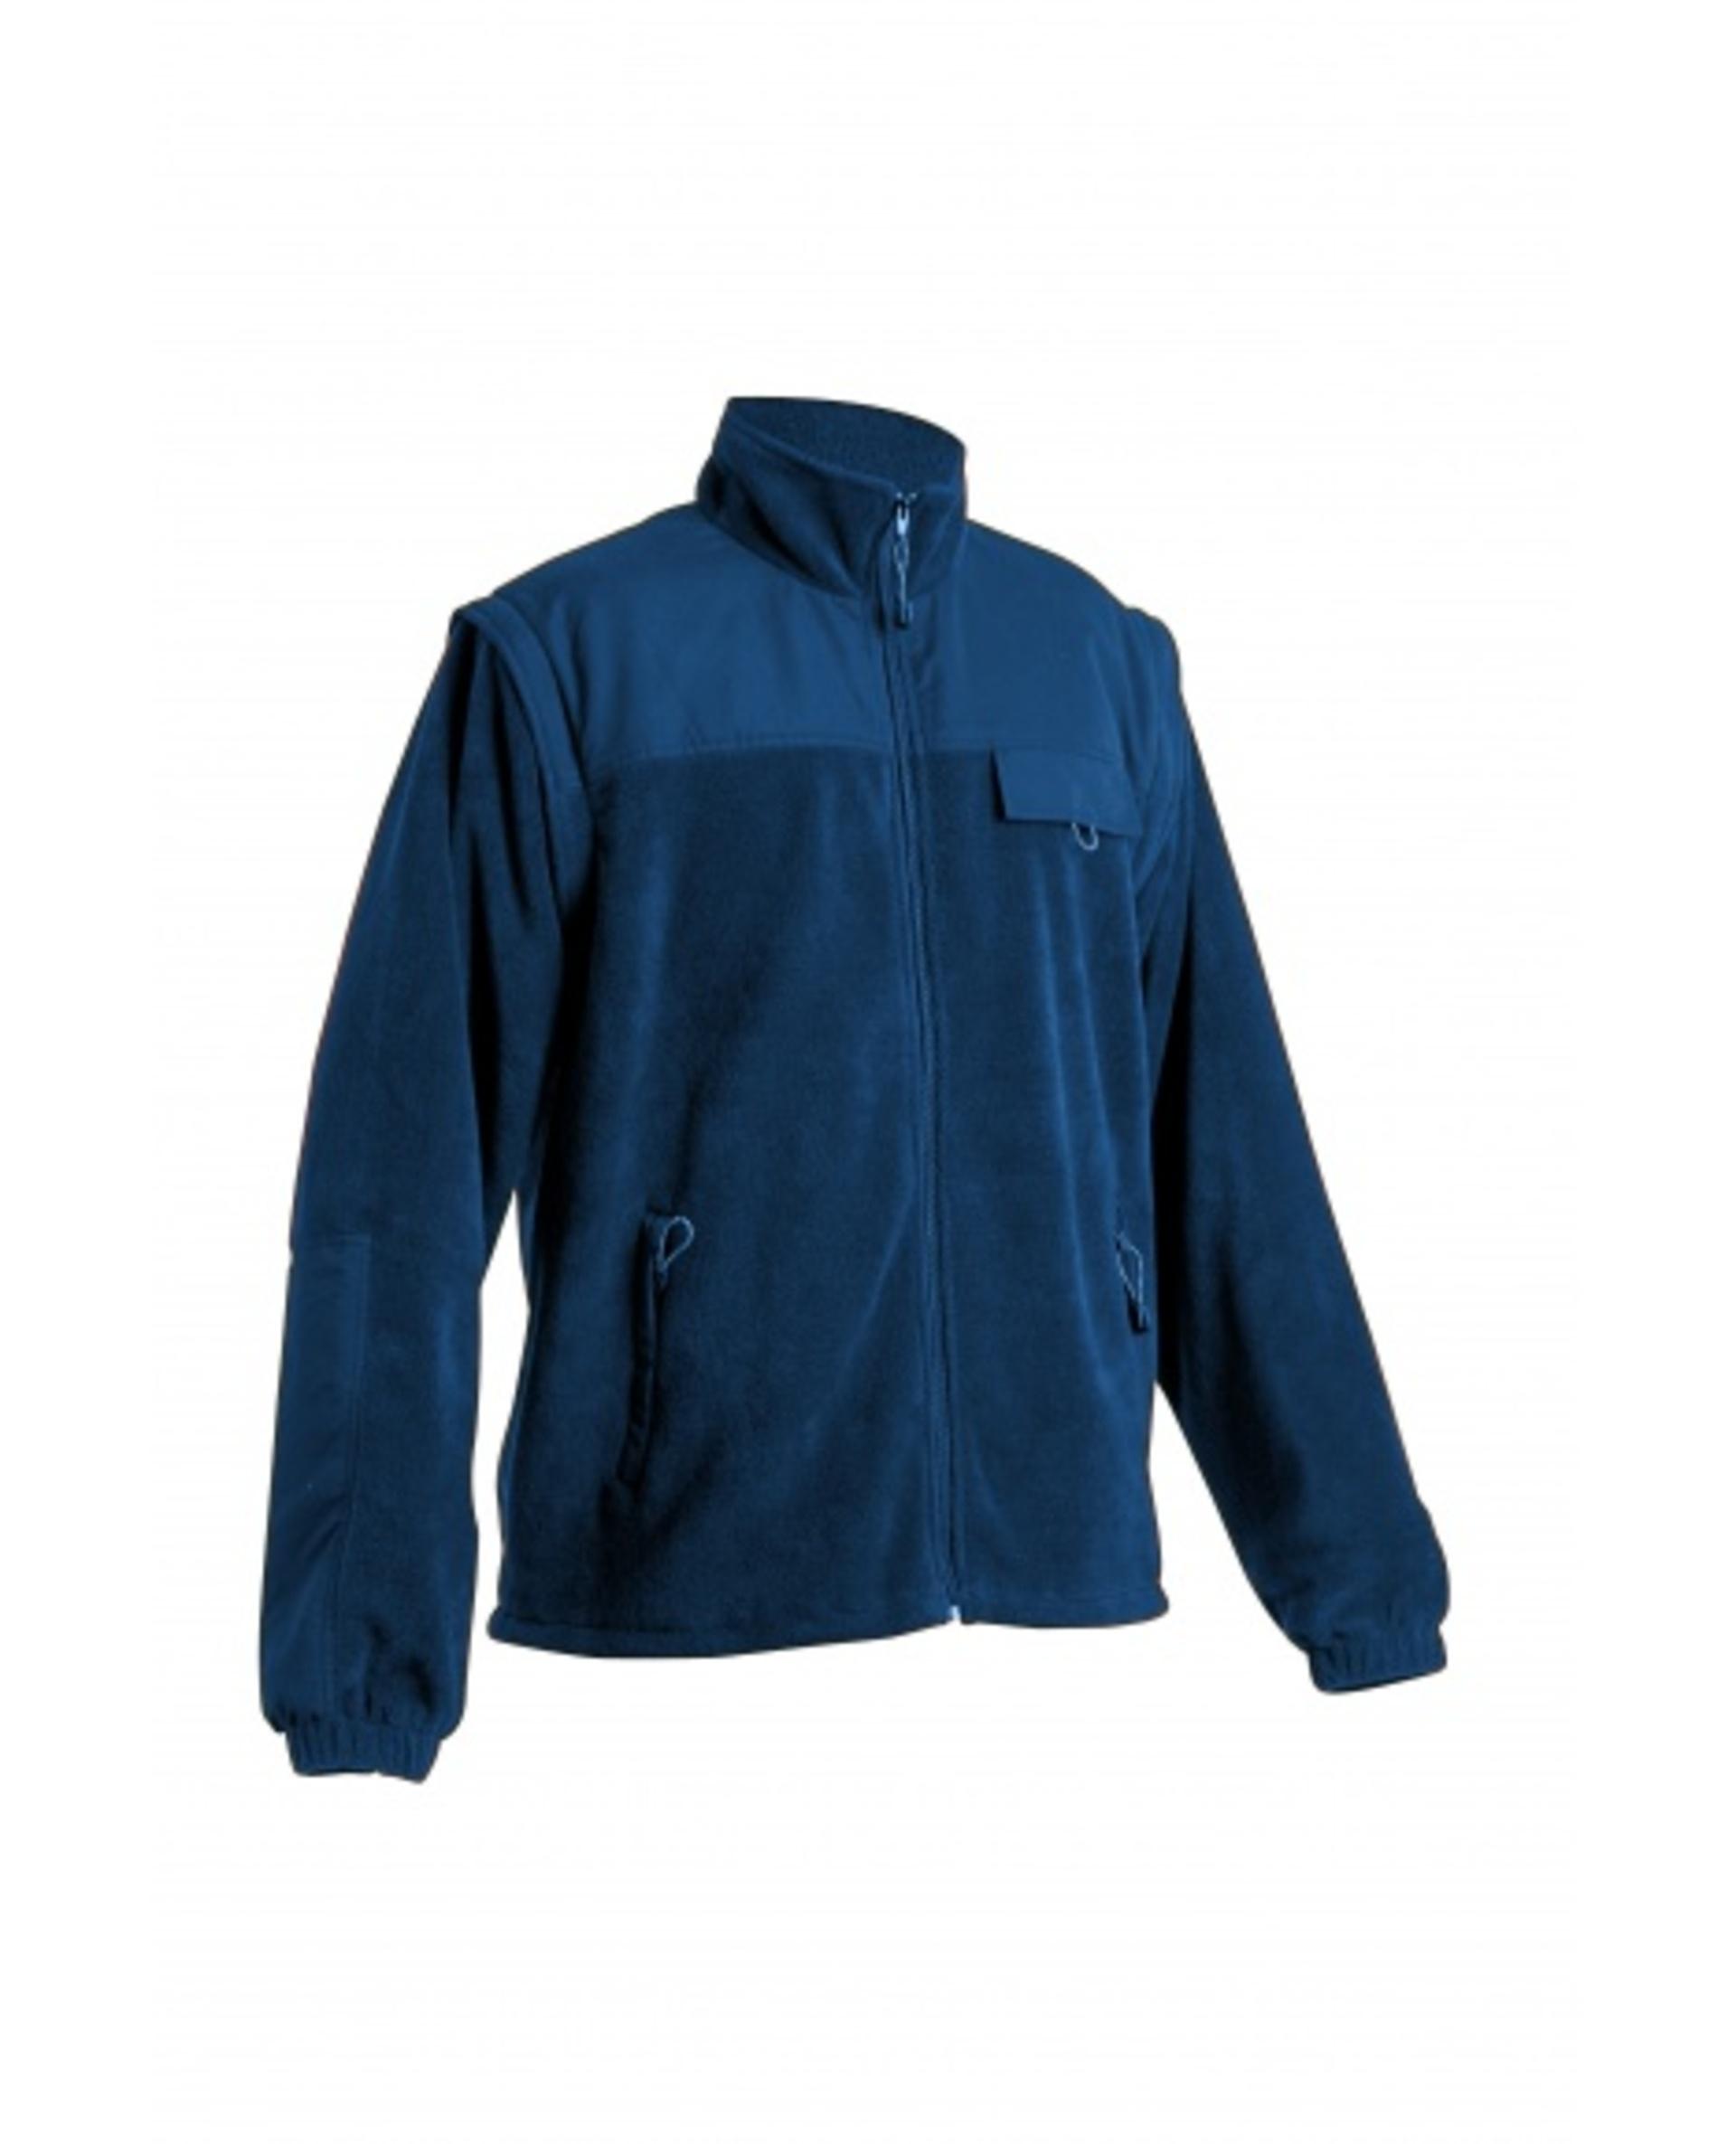 Cerva RANDWIK fleecová 2v1 Bunda tmavě modrá M